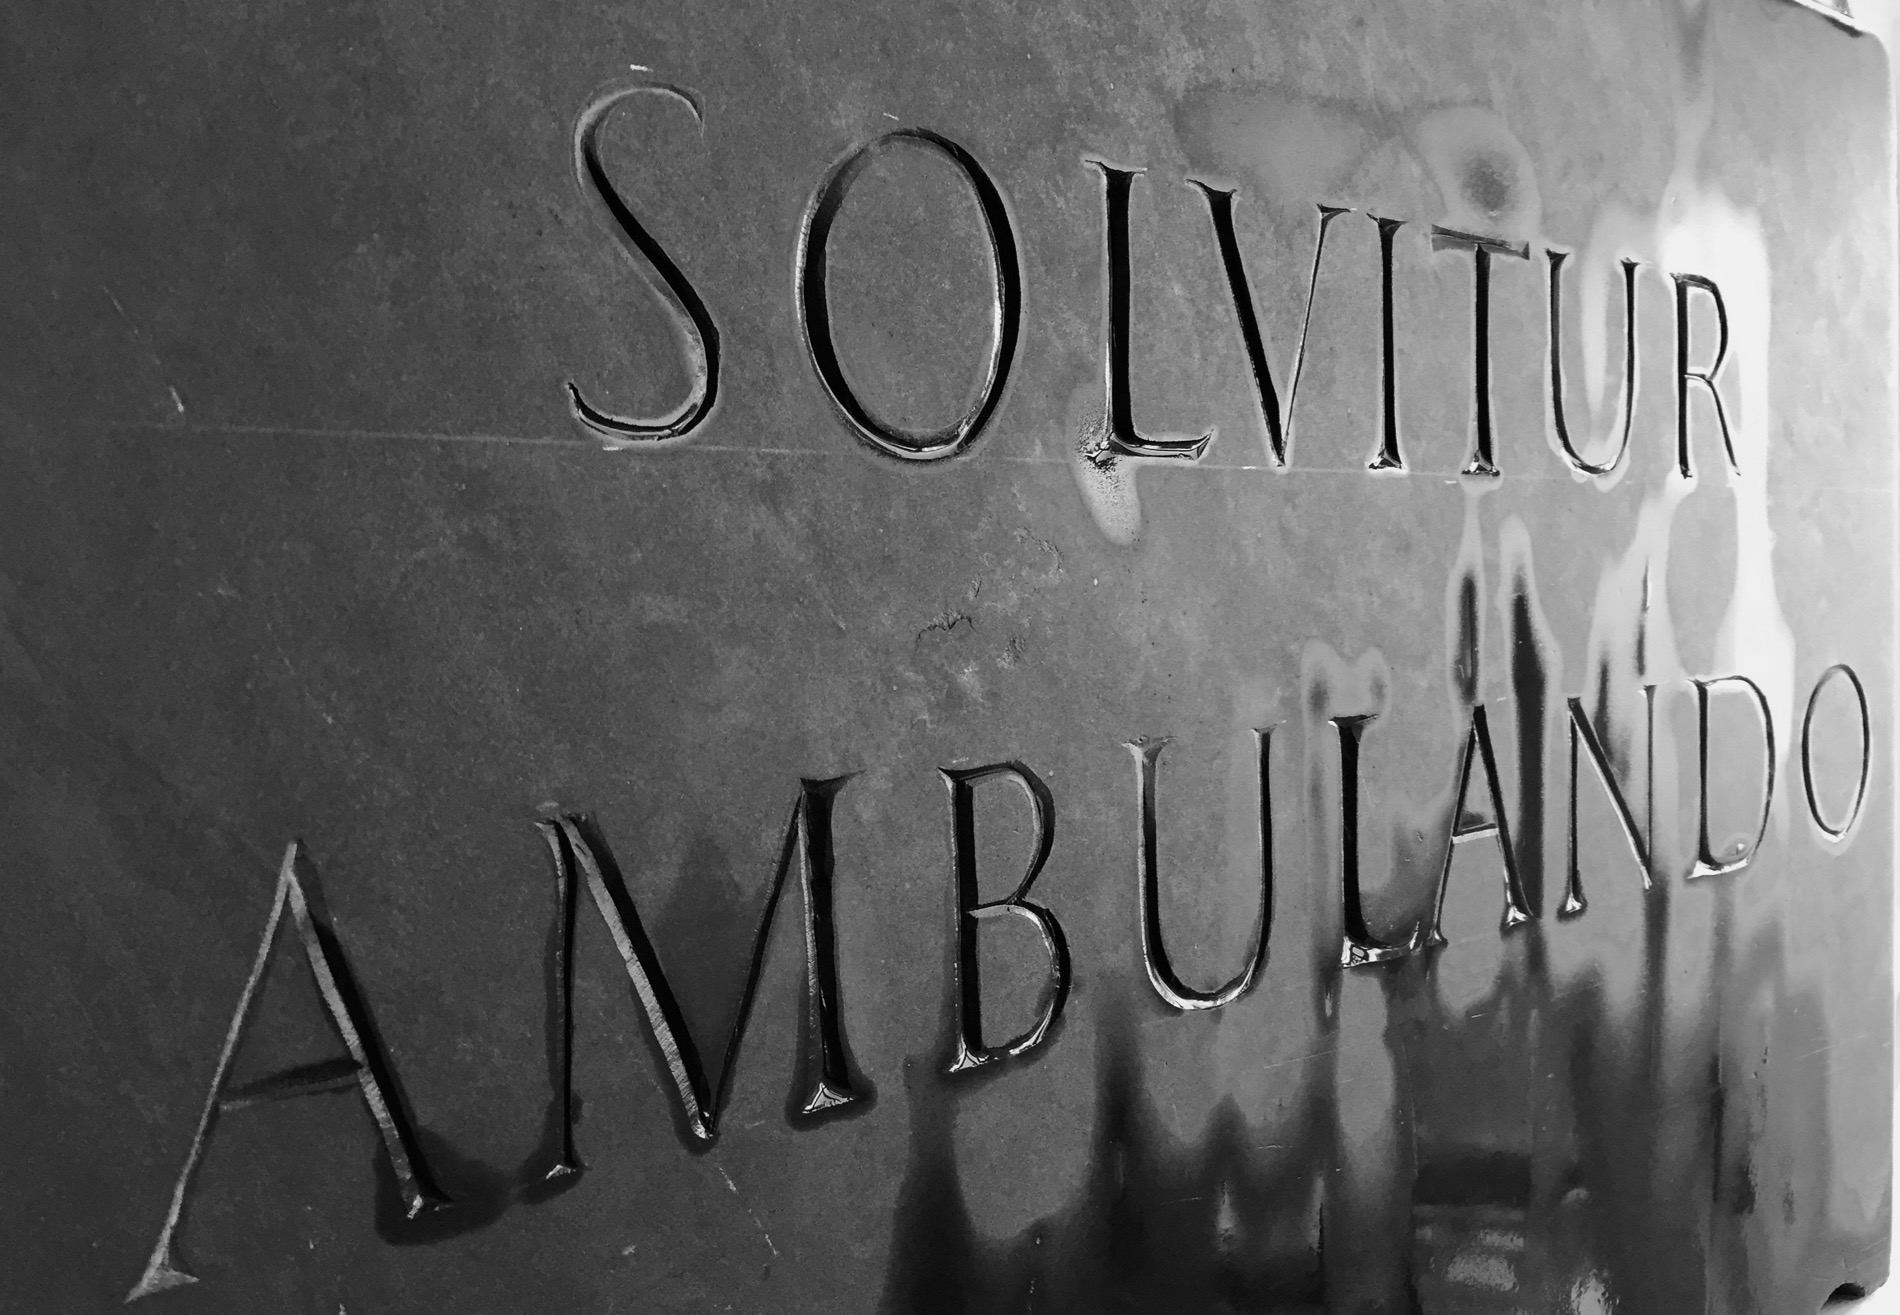 Solvitur Ambulando, slate 40cm x 30cm